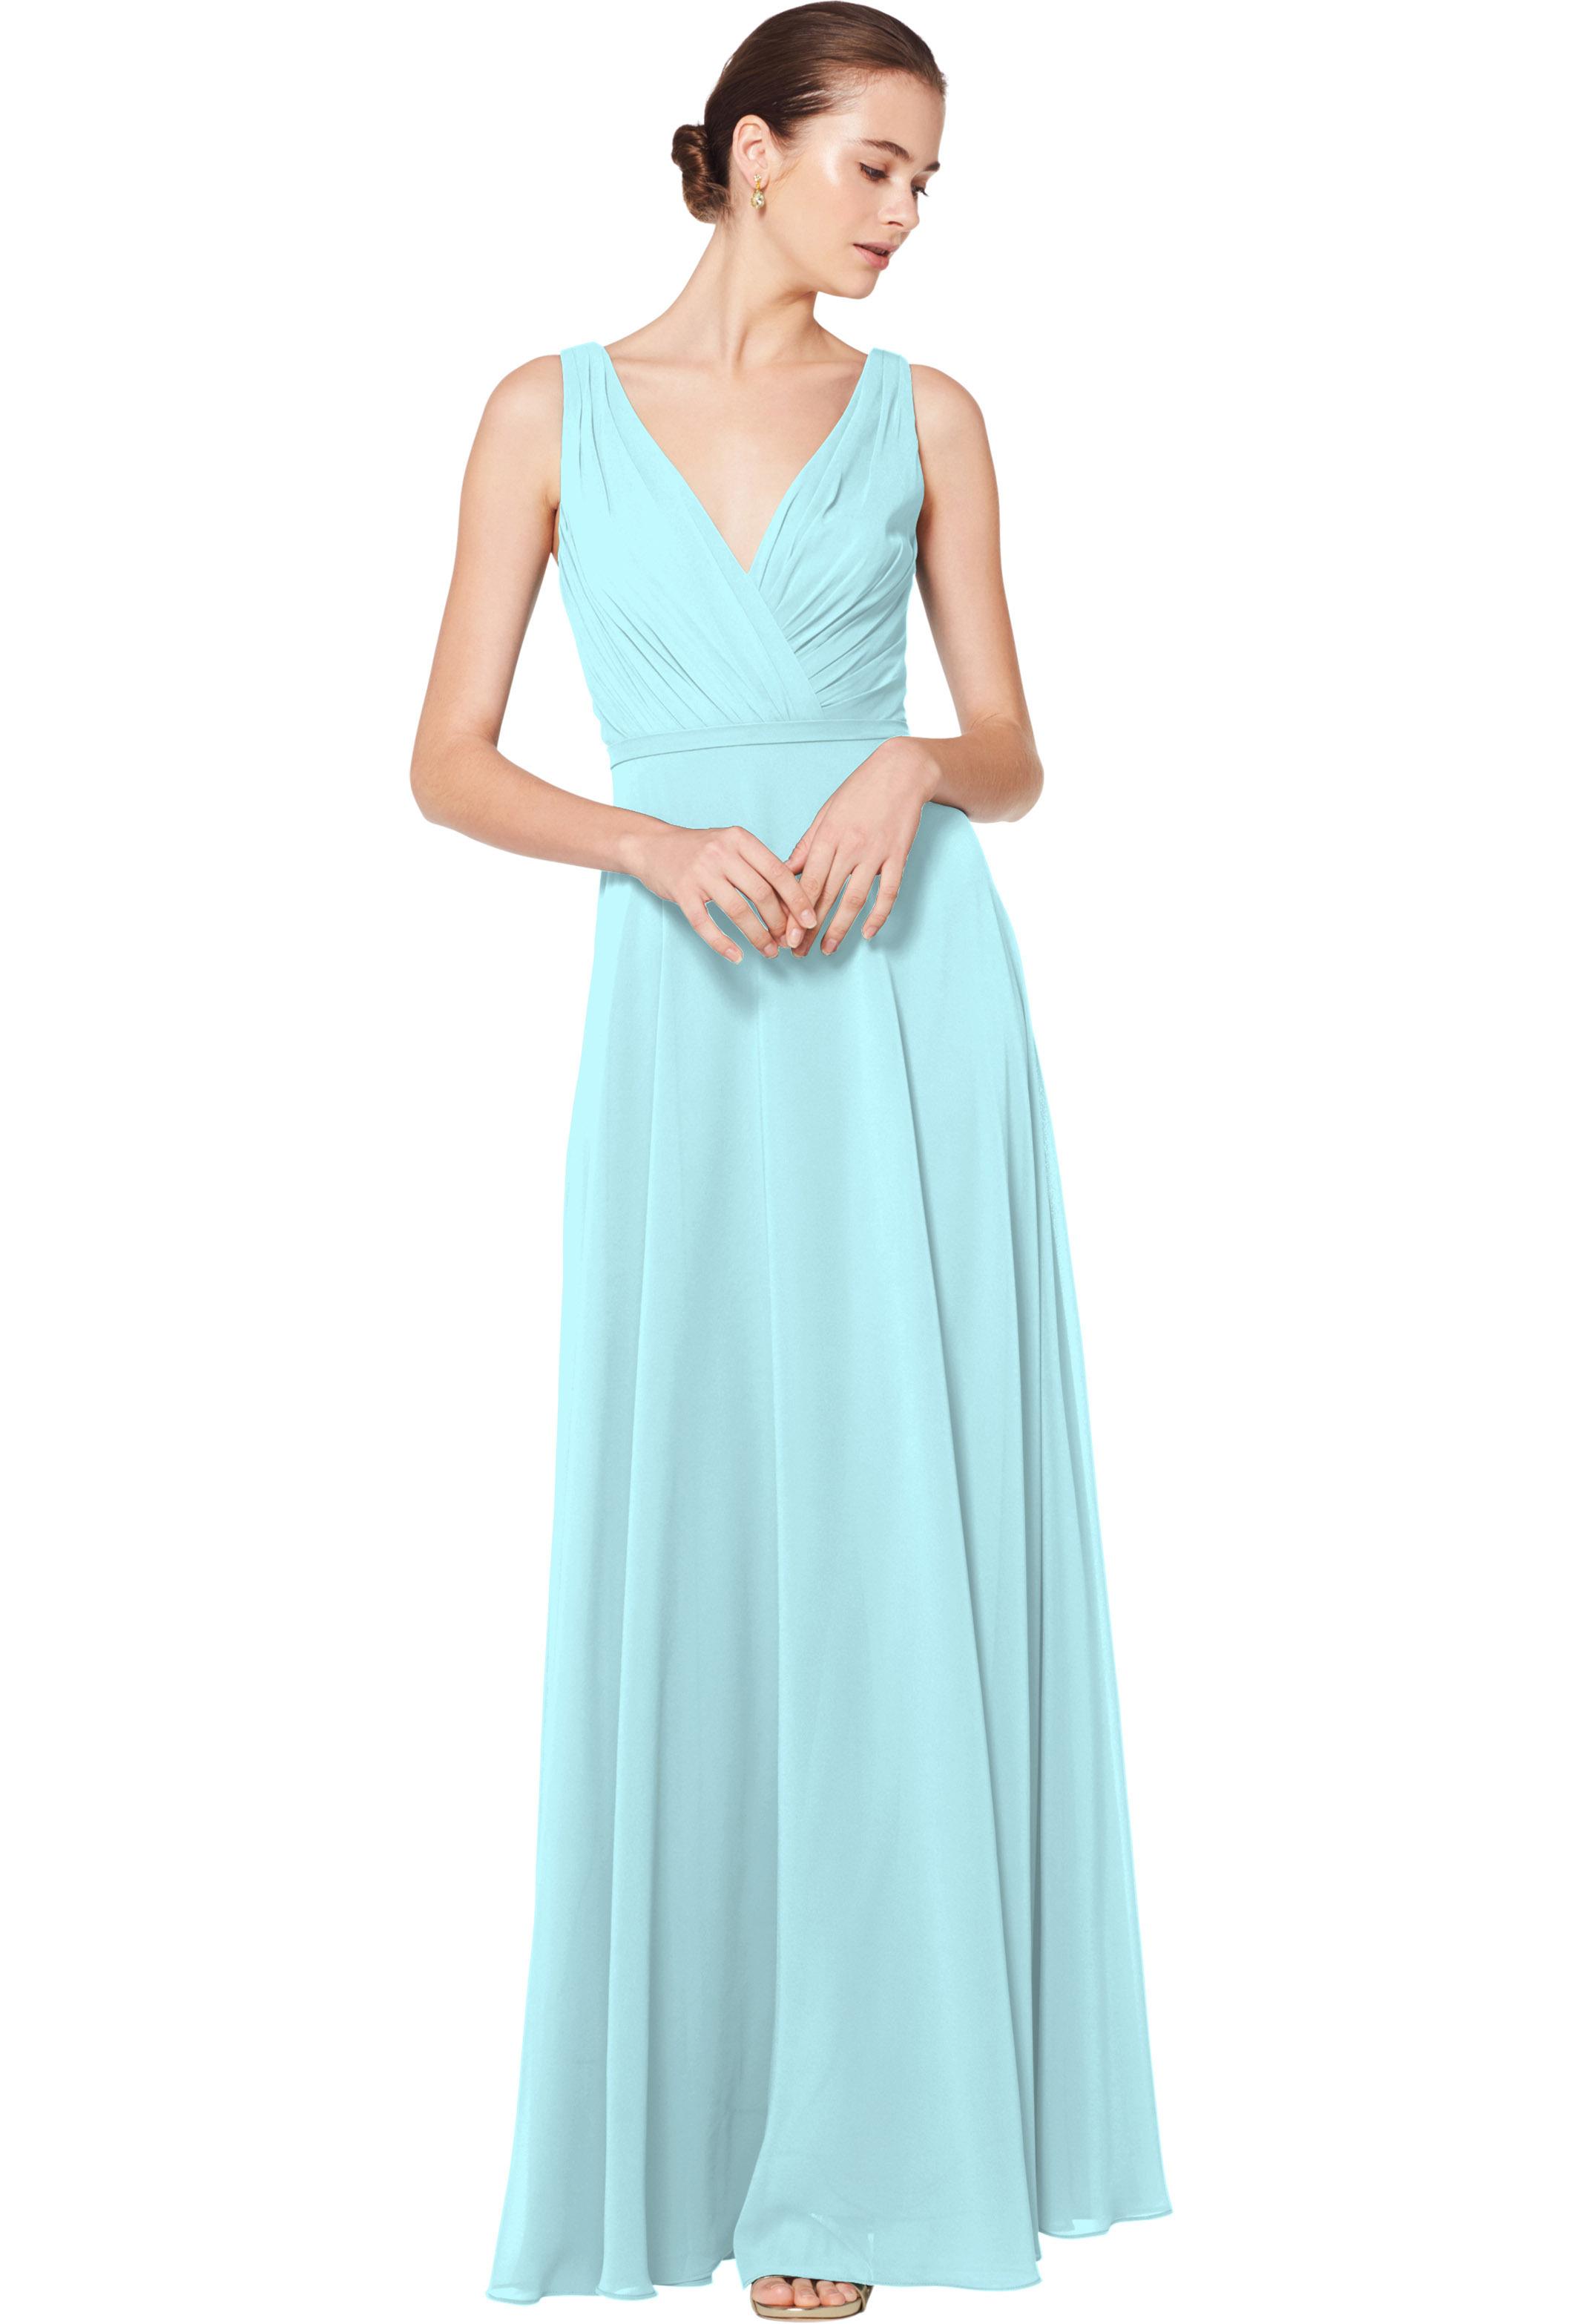 Bill Levkoff GLACIER Chiffon Sleeveless A-line gown, $180.00 Front